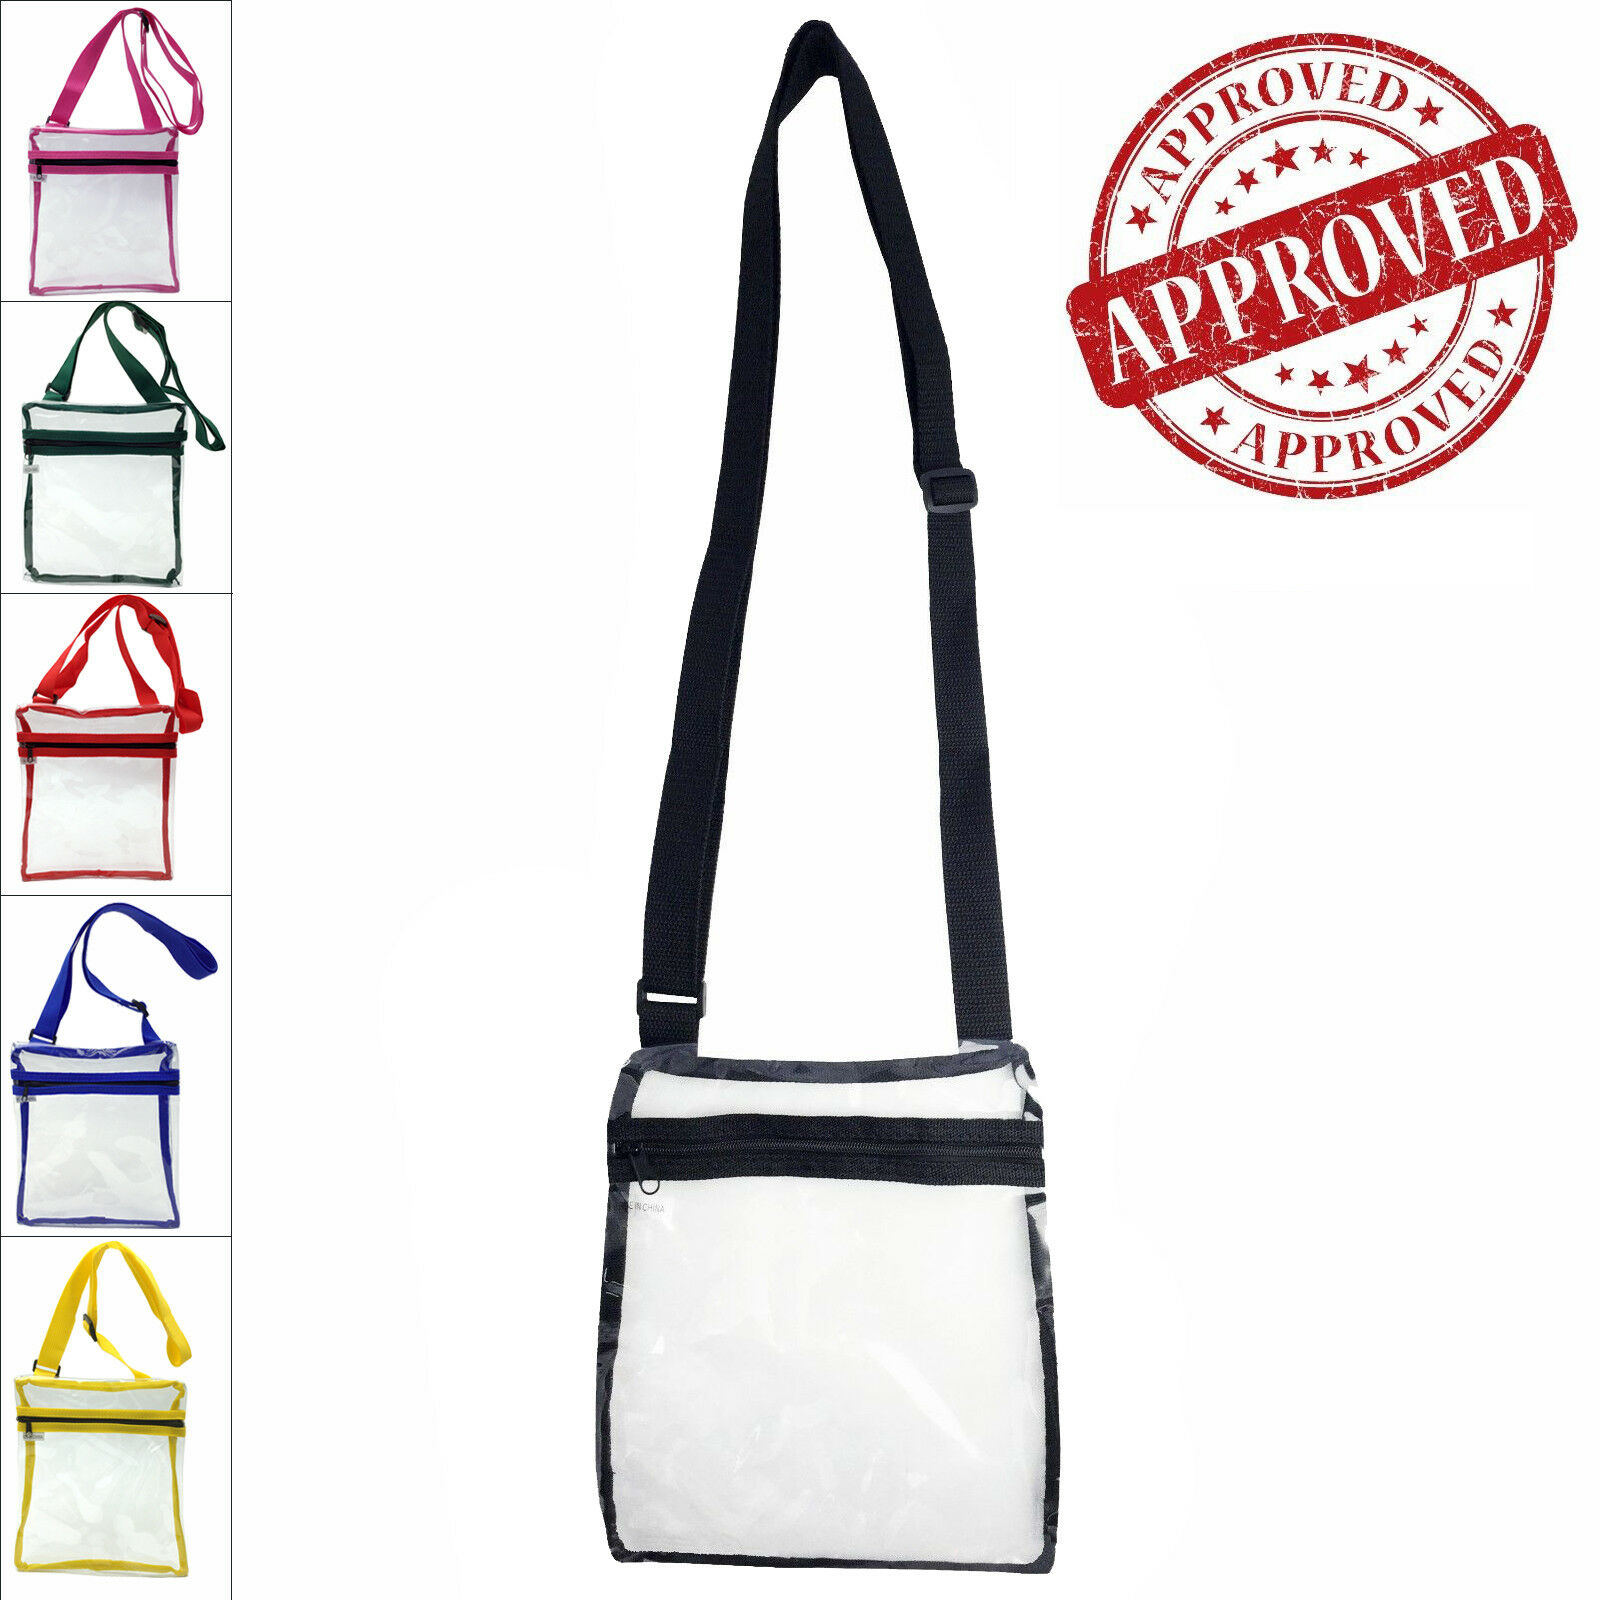 Transparent Stylish PVC Purse Clear Handbag Tote Shoulder Cr